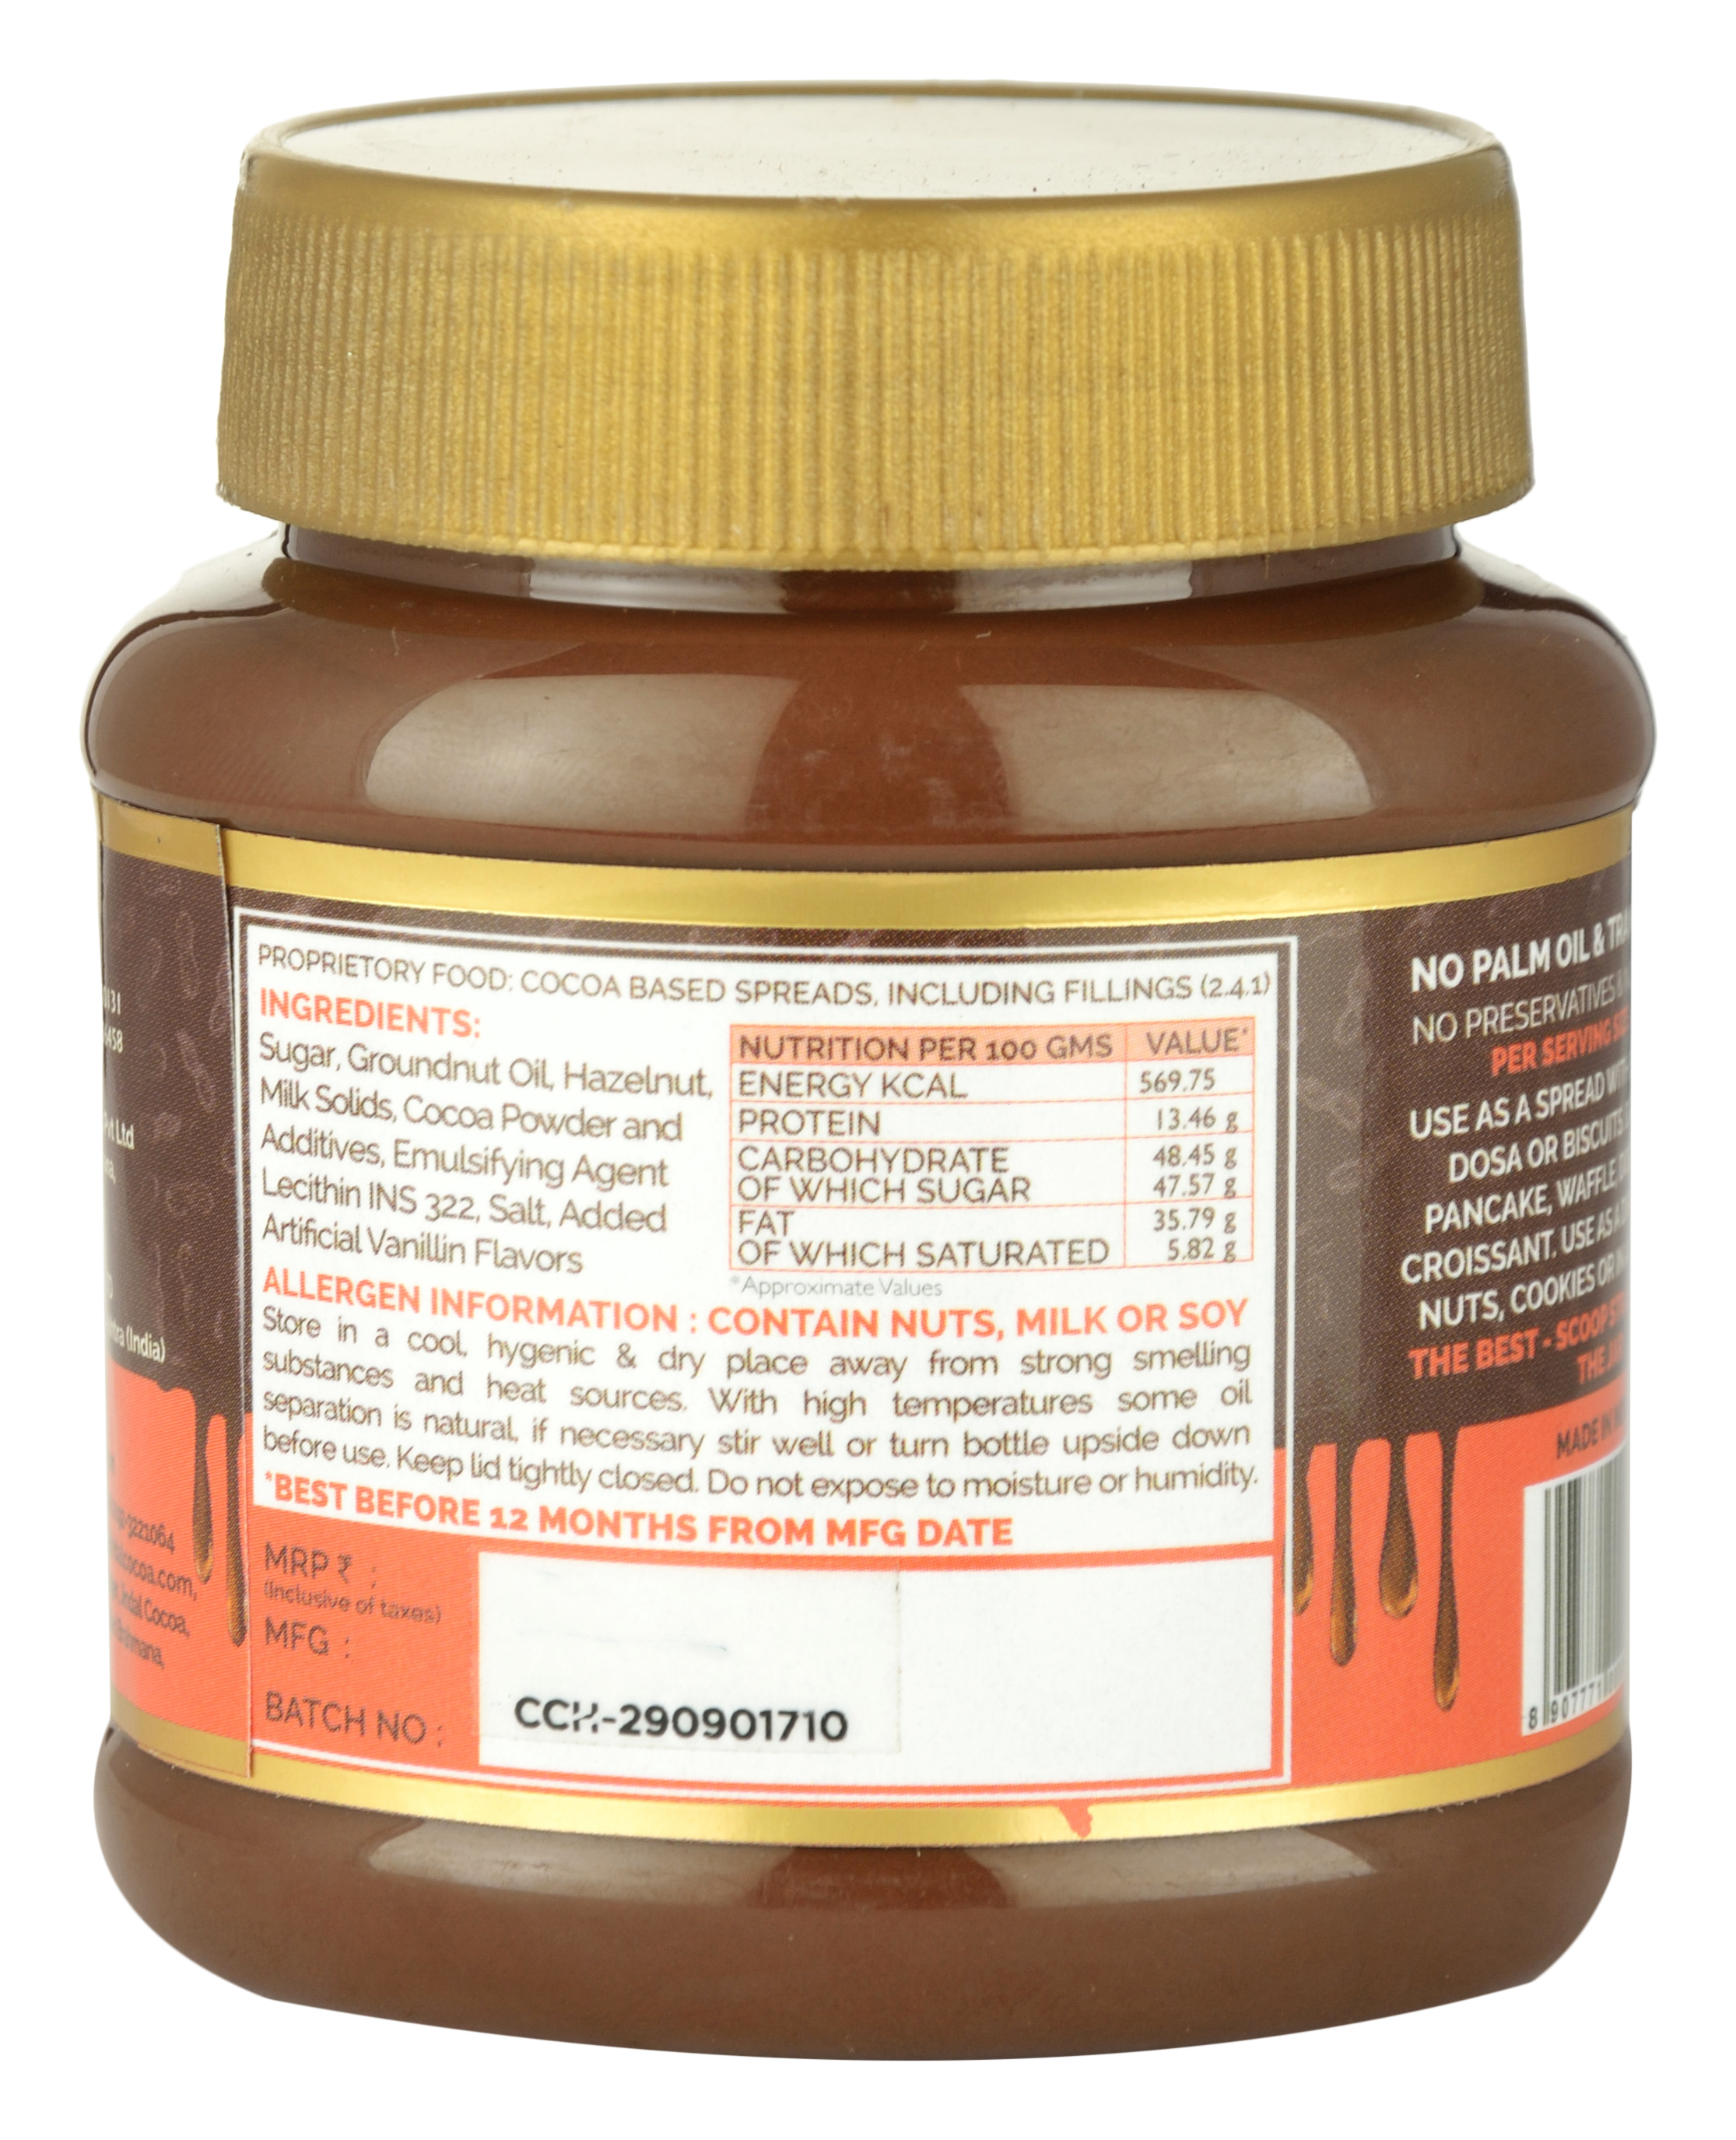 Chocolate-Spreads-Cocoa-Hazelnut-Cream160_2